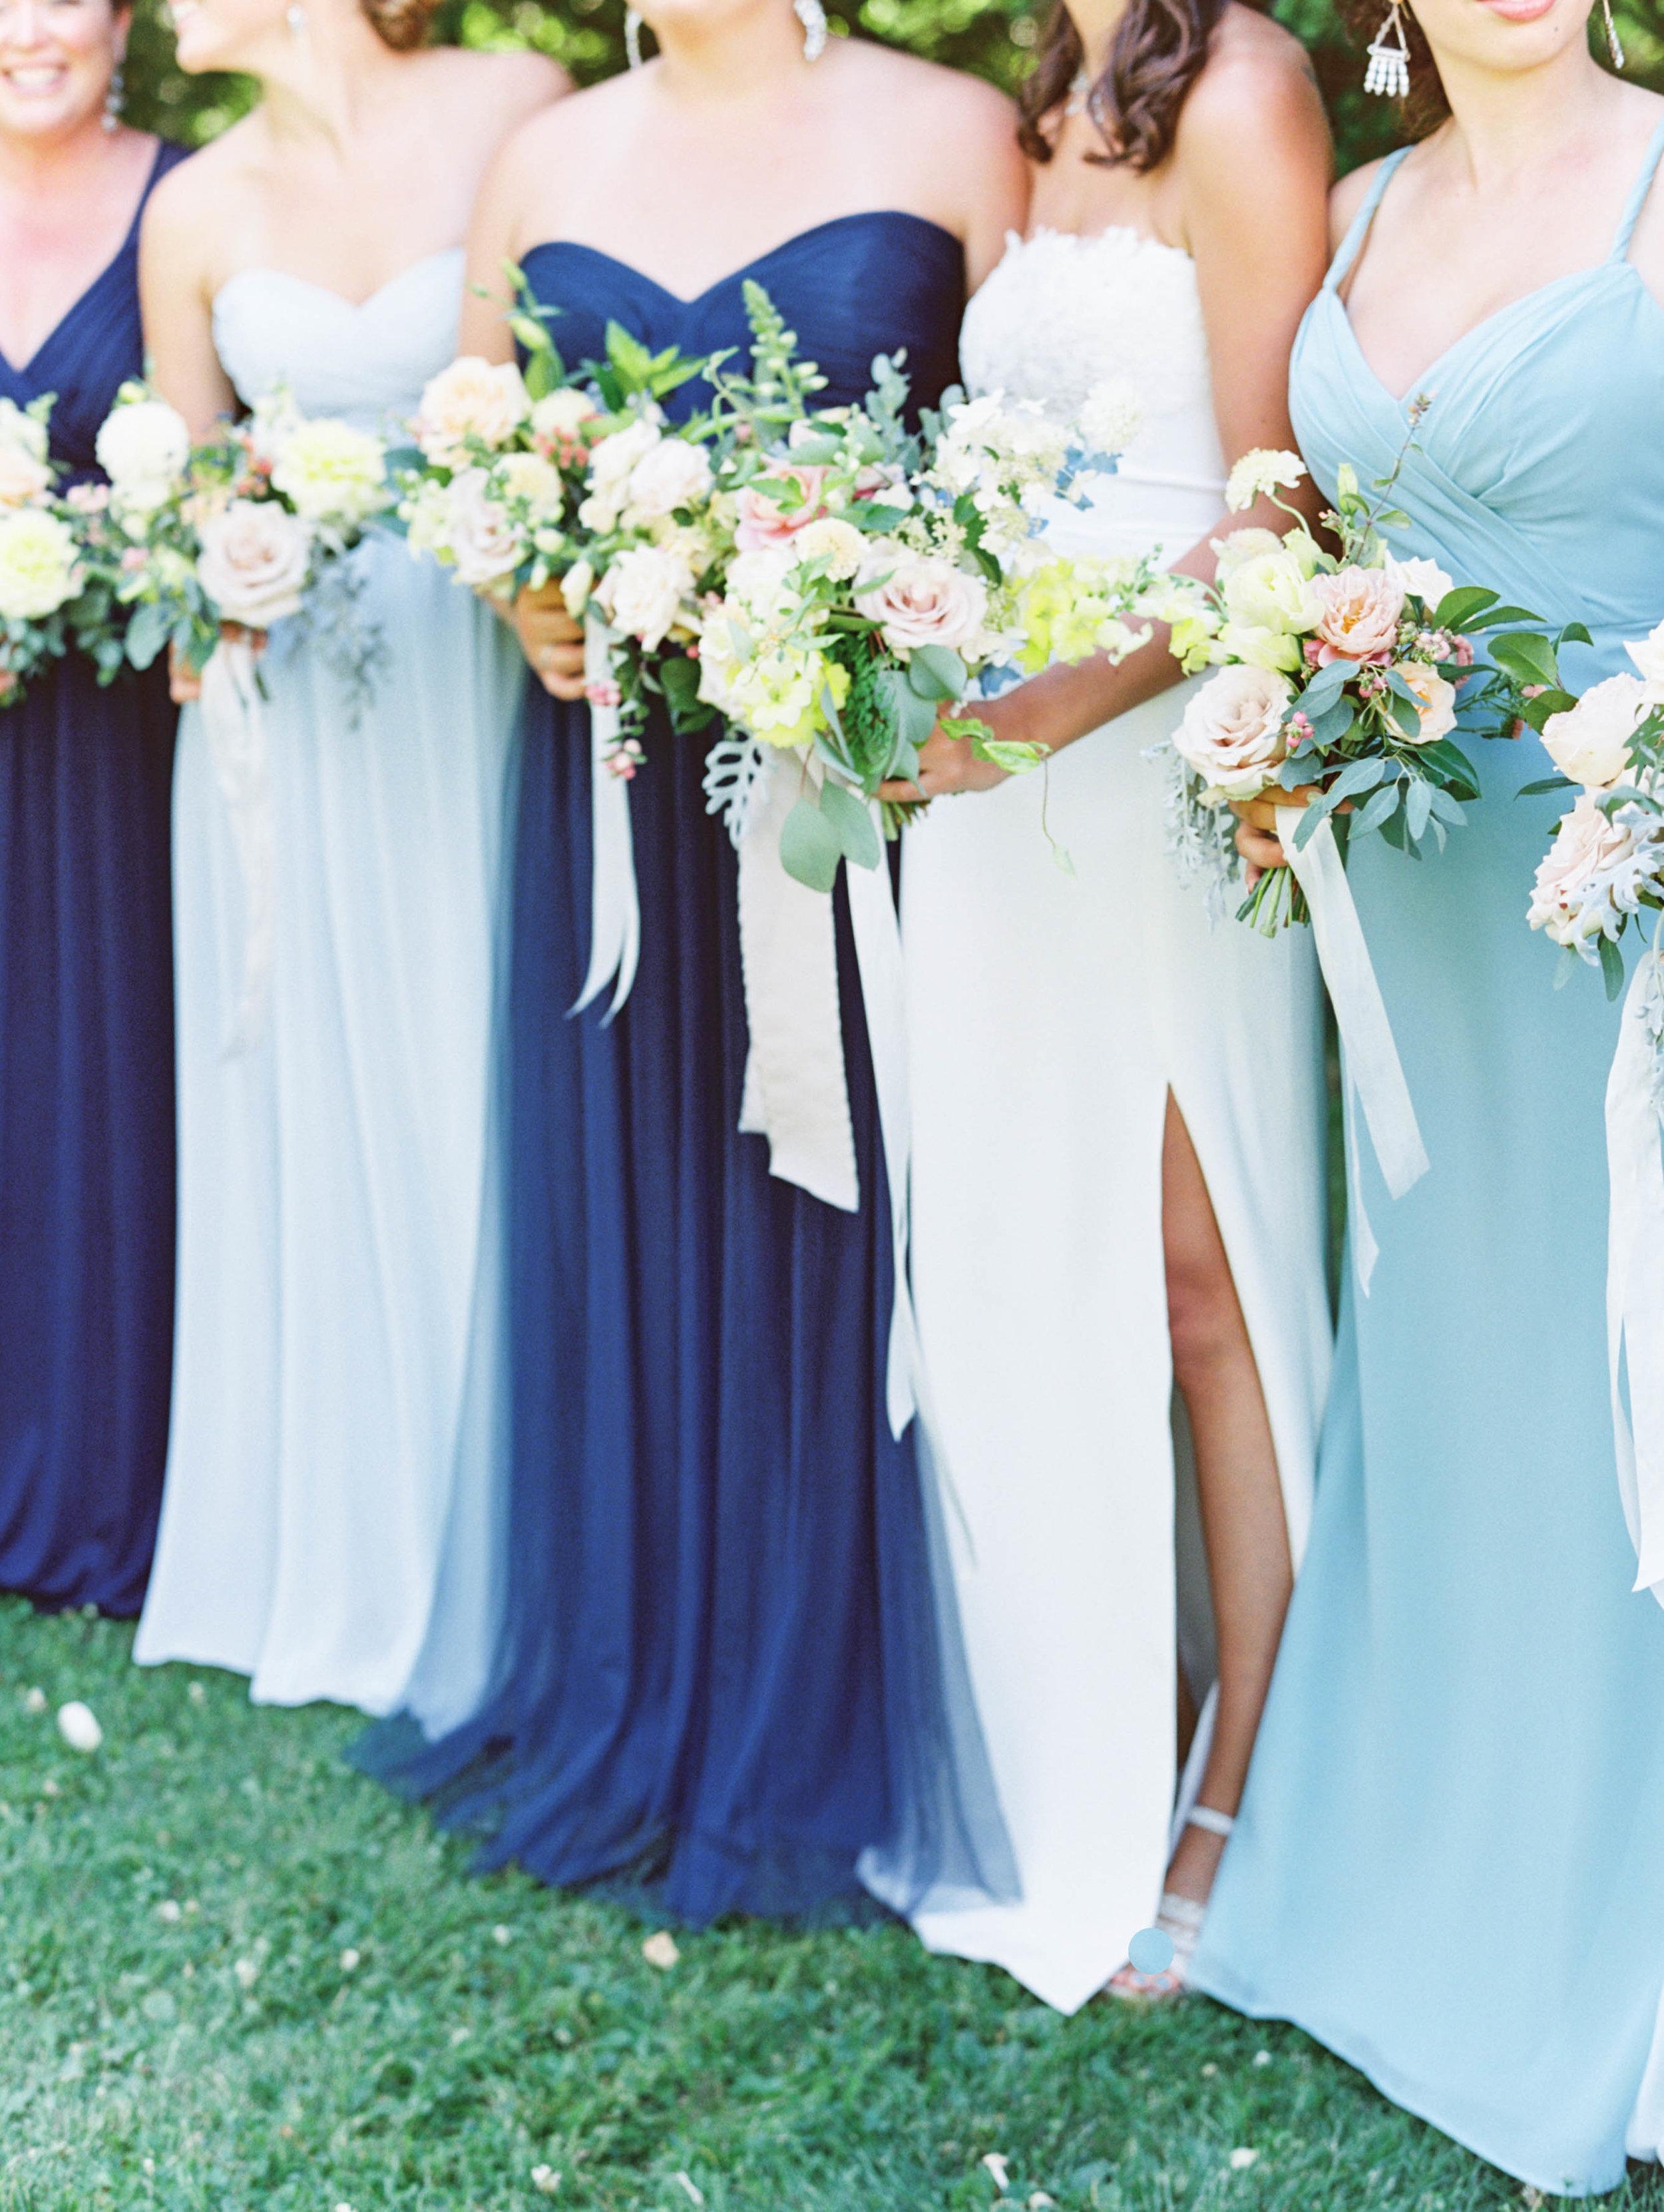 bridesmaids in blue for outdoor oregon wedding at mt hood organic farms.jpg